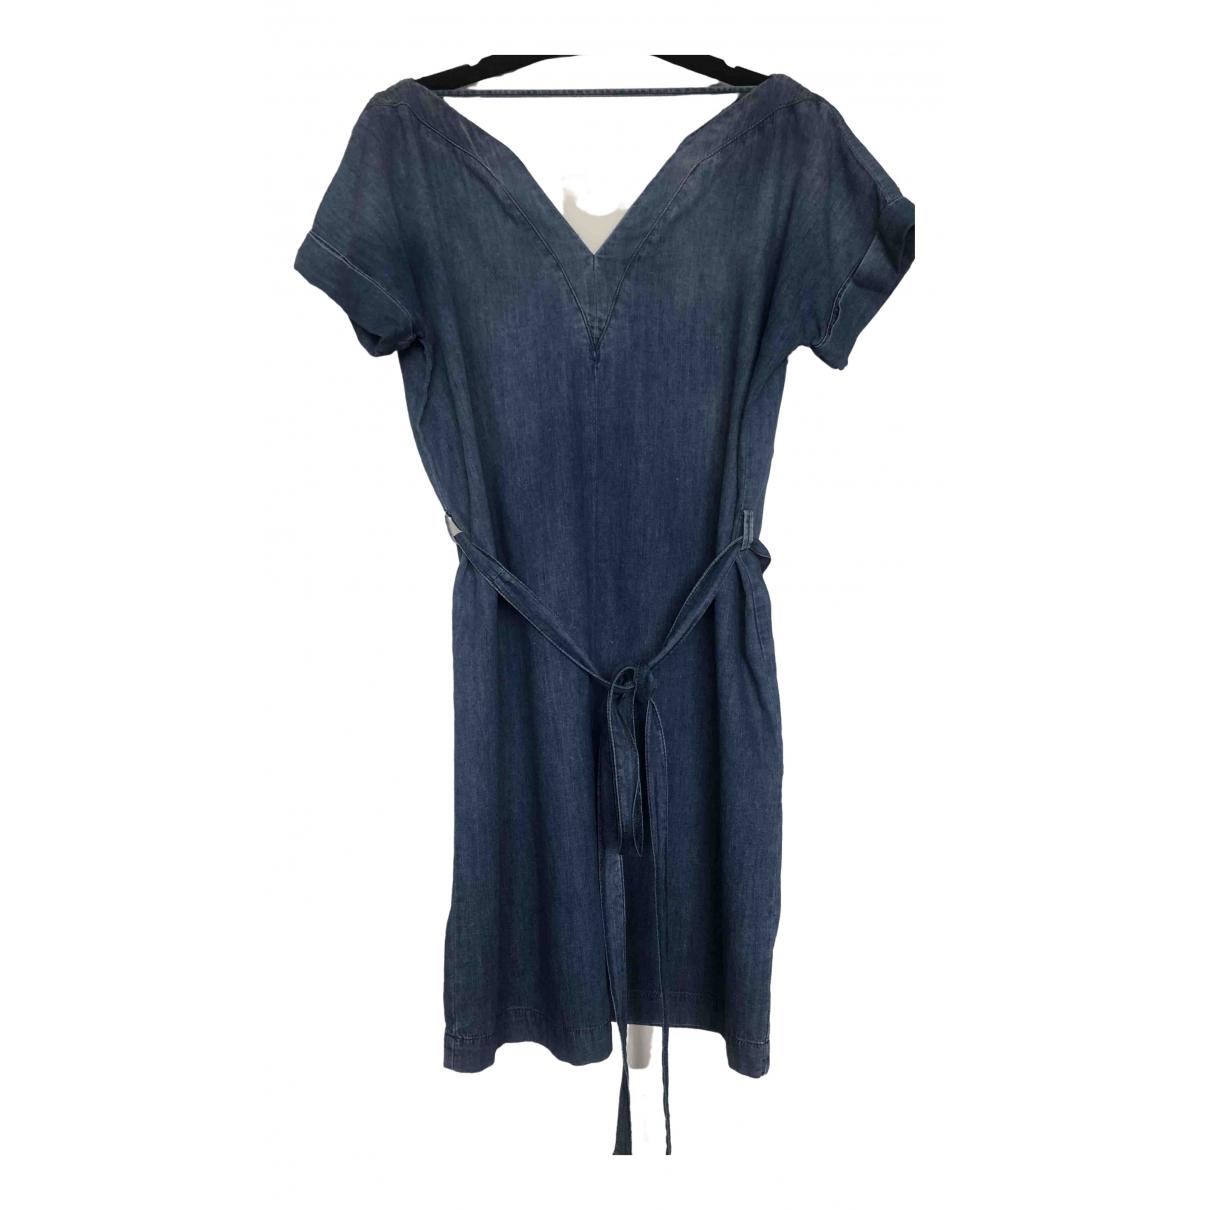 Diesel - Robe   pour femme en denim - bleu